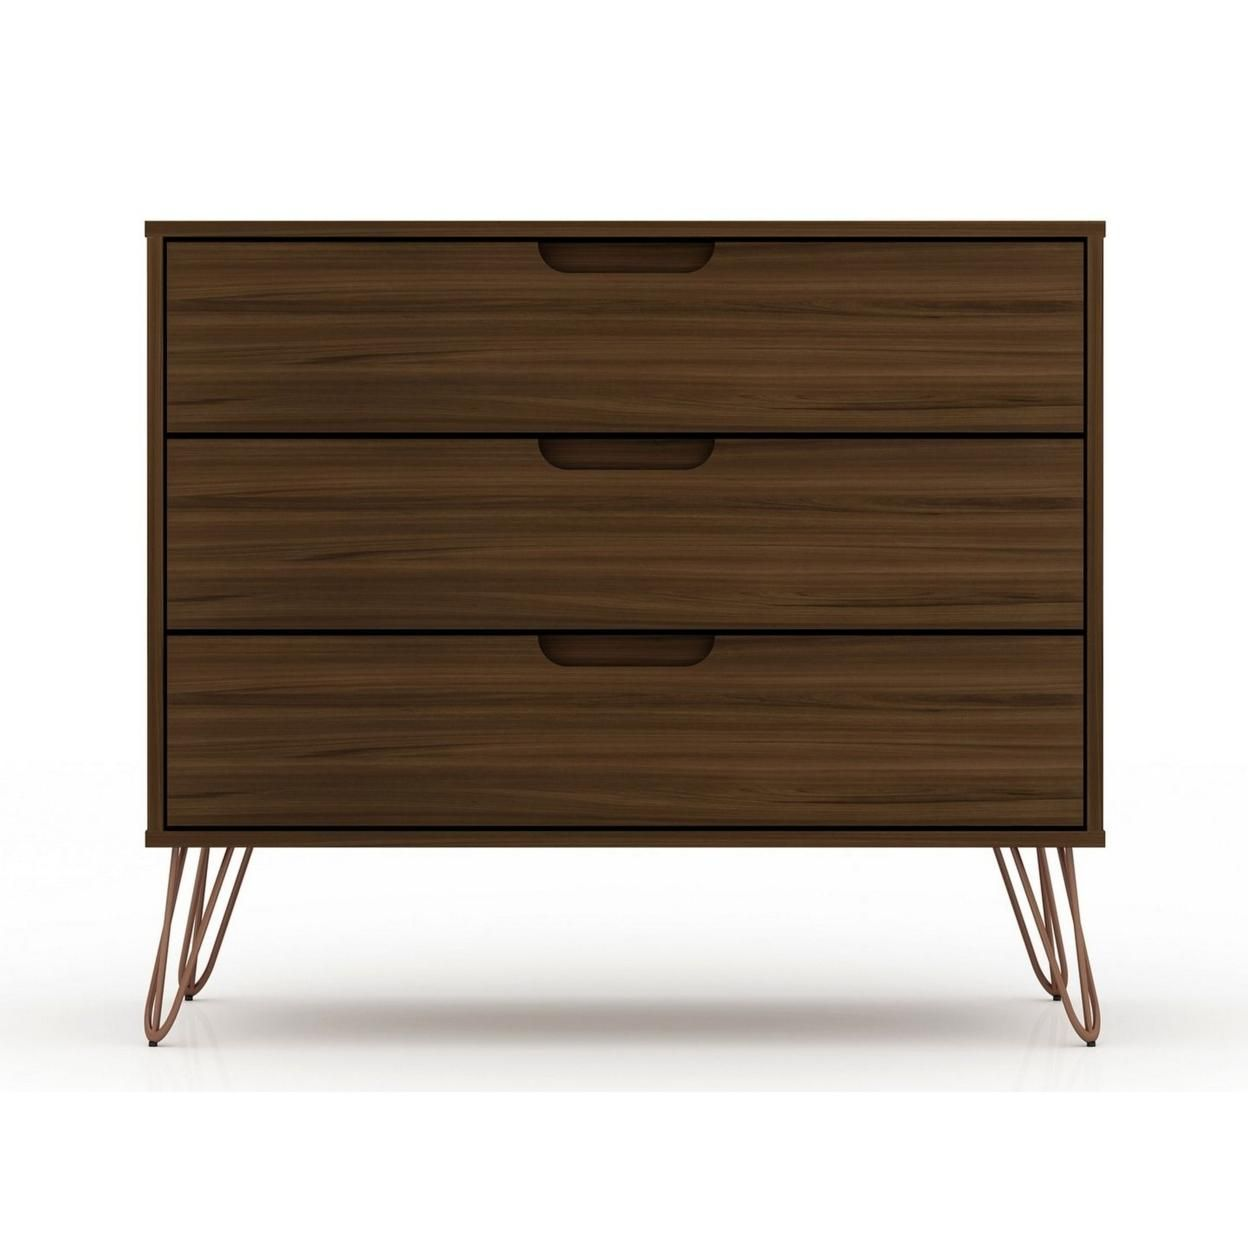 Rockefeller Mid-Century- Modern Dresser with 3- Drawers in Brown